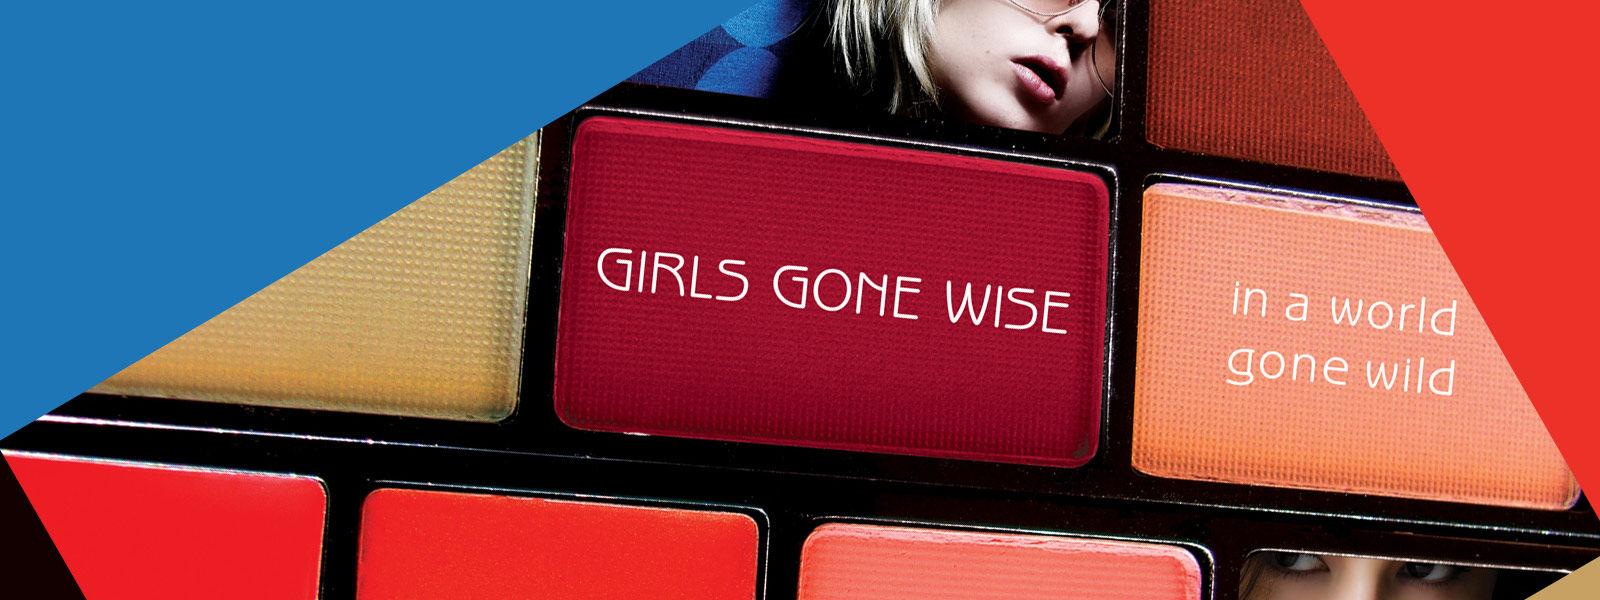 Girls Gone Wise